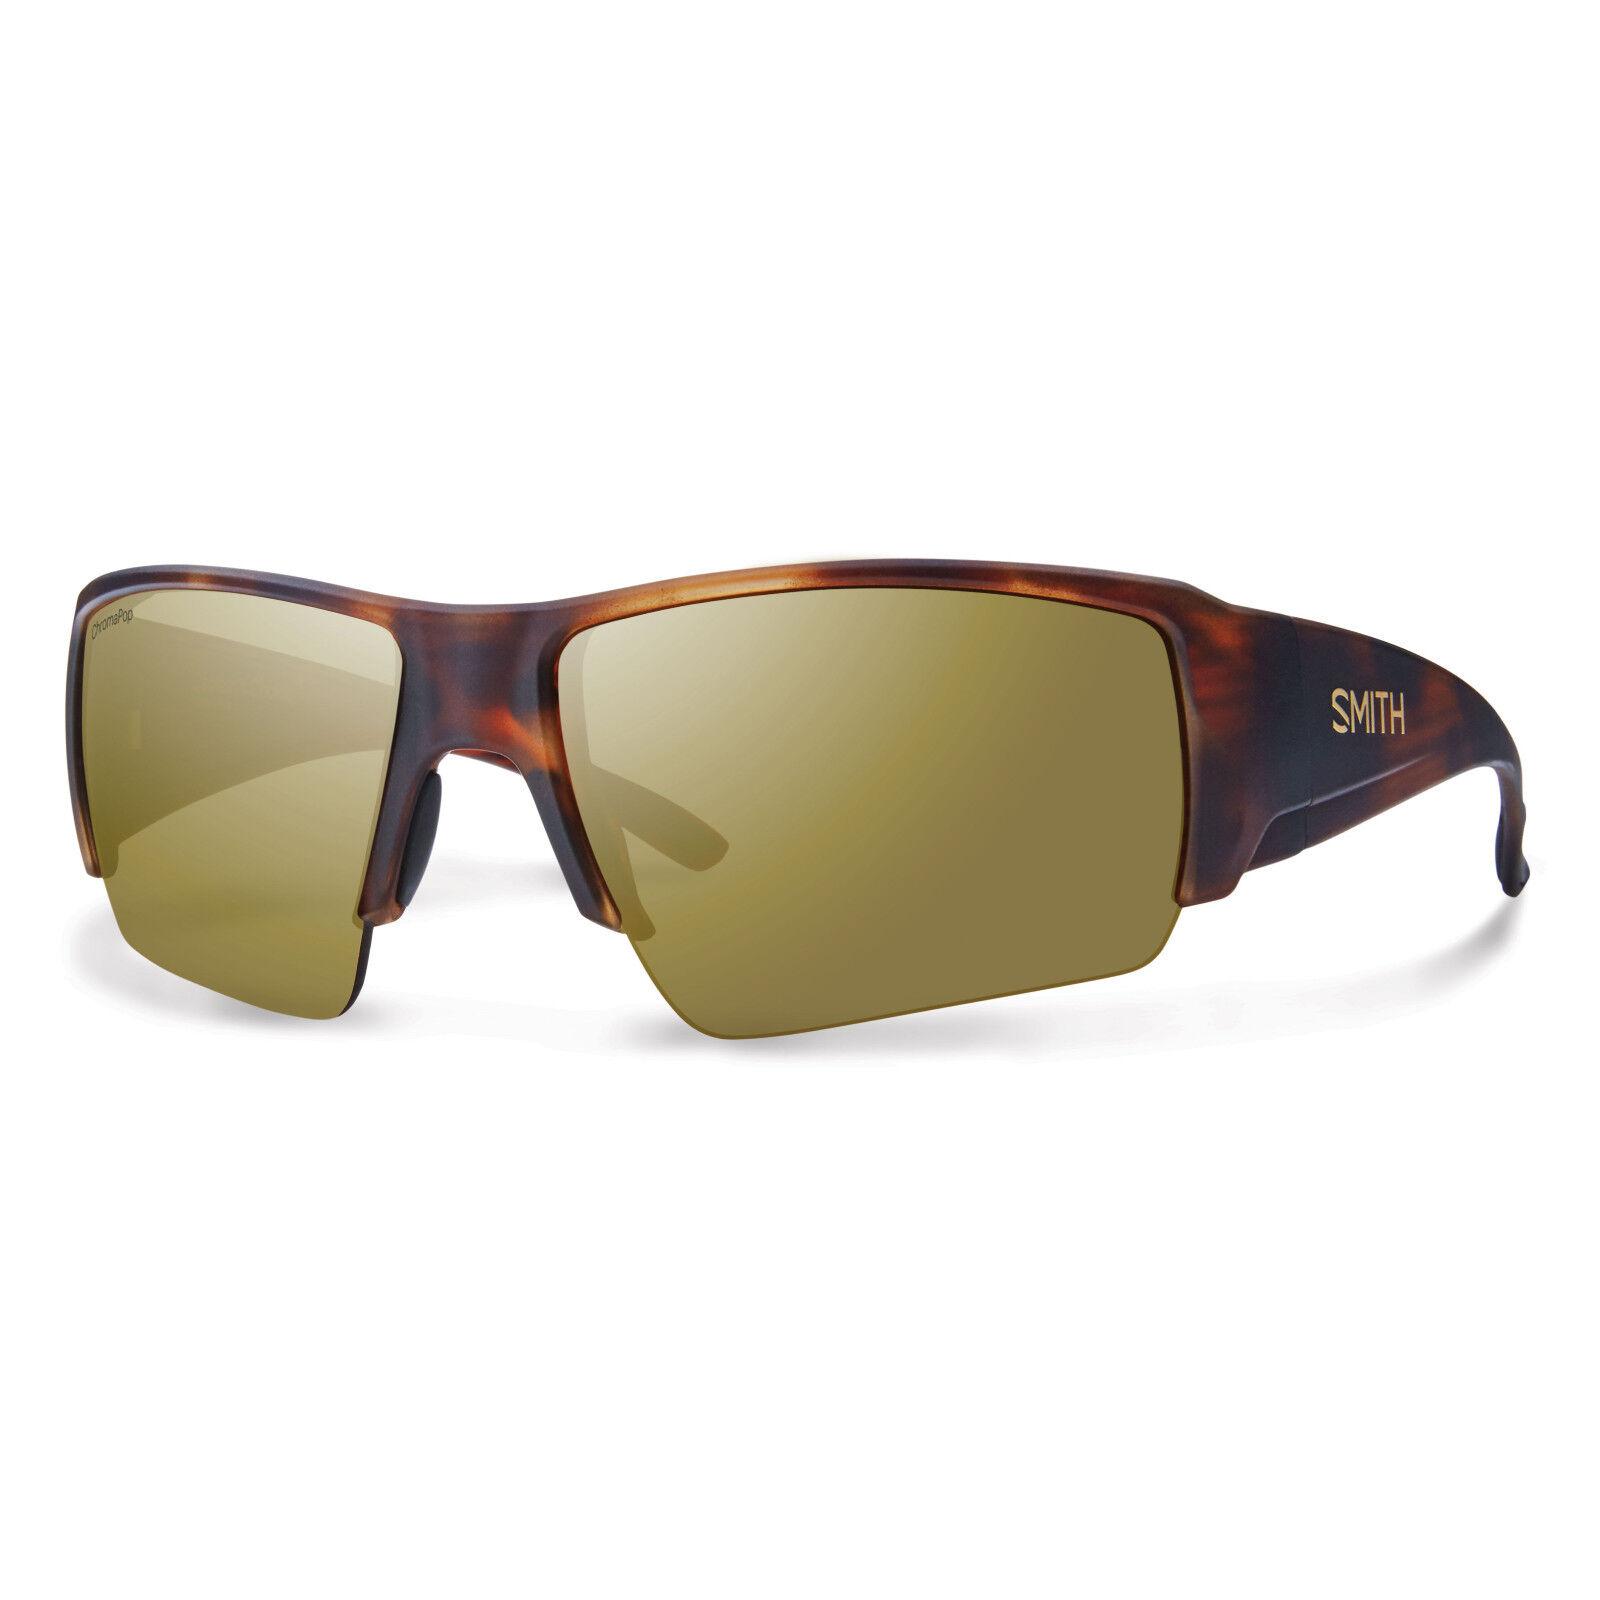 Smith Captain's Choice  Sun Glasses - Matte Havana  Chromapop+ Polar Brown Mirror  cheap designer brands